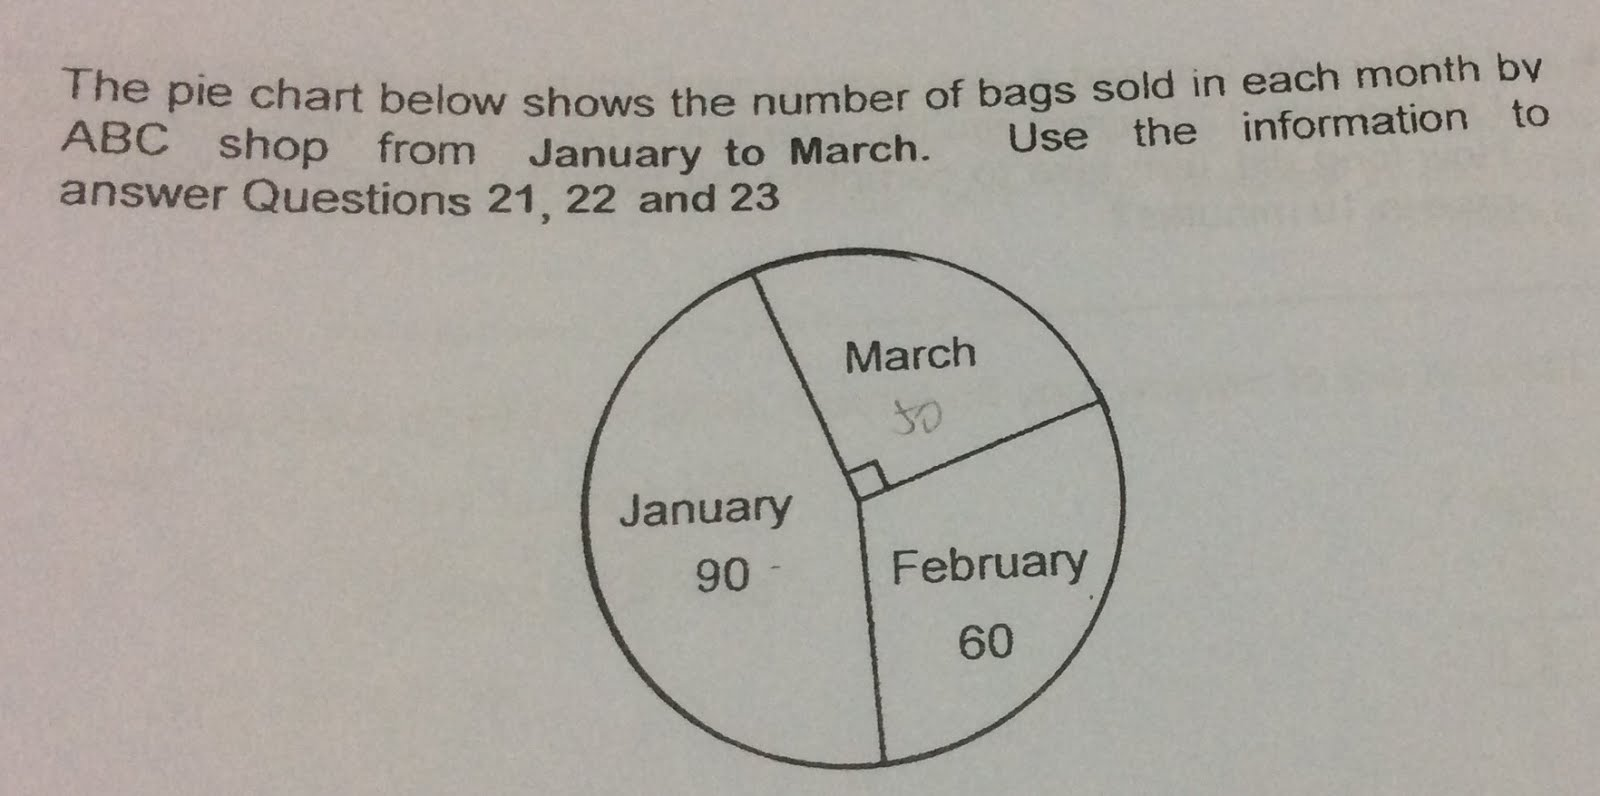 Changs math blog p6 pie chart percentage fr rq p6 pie chart percentage fr rq nvjuhfo Gallery